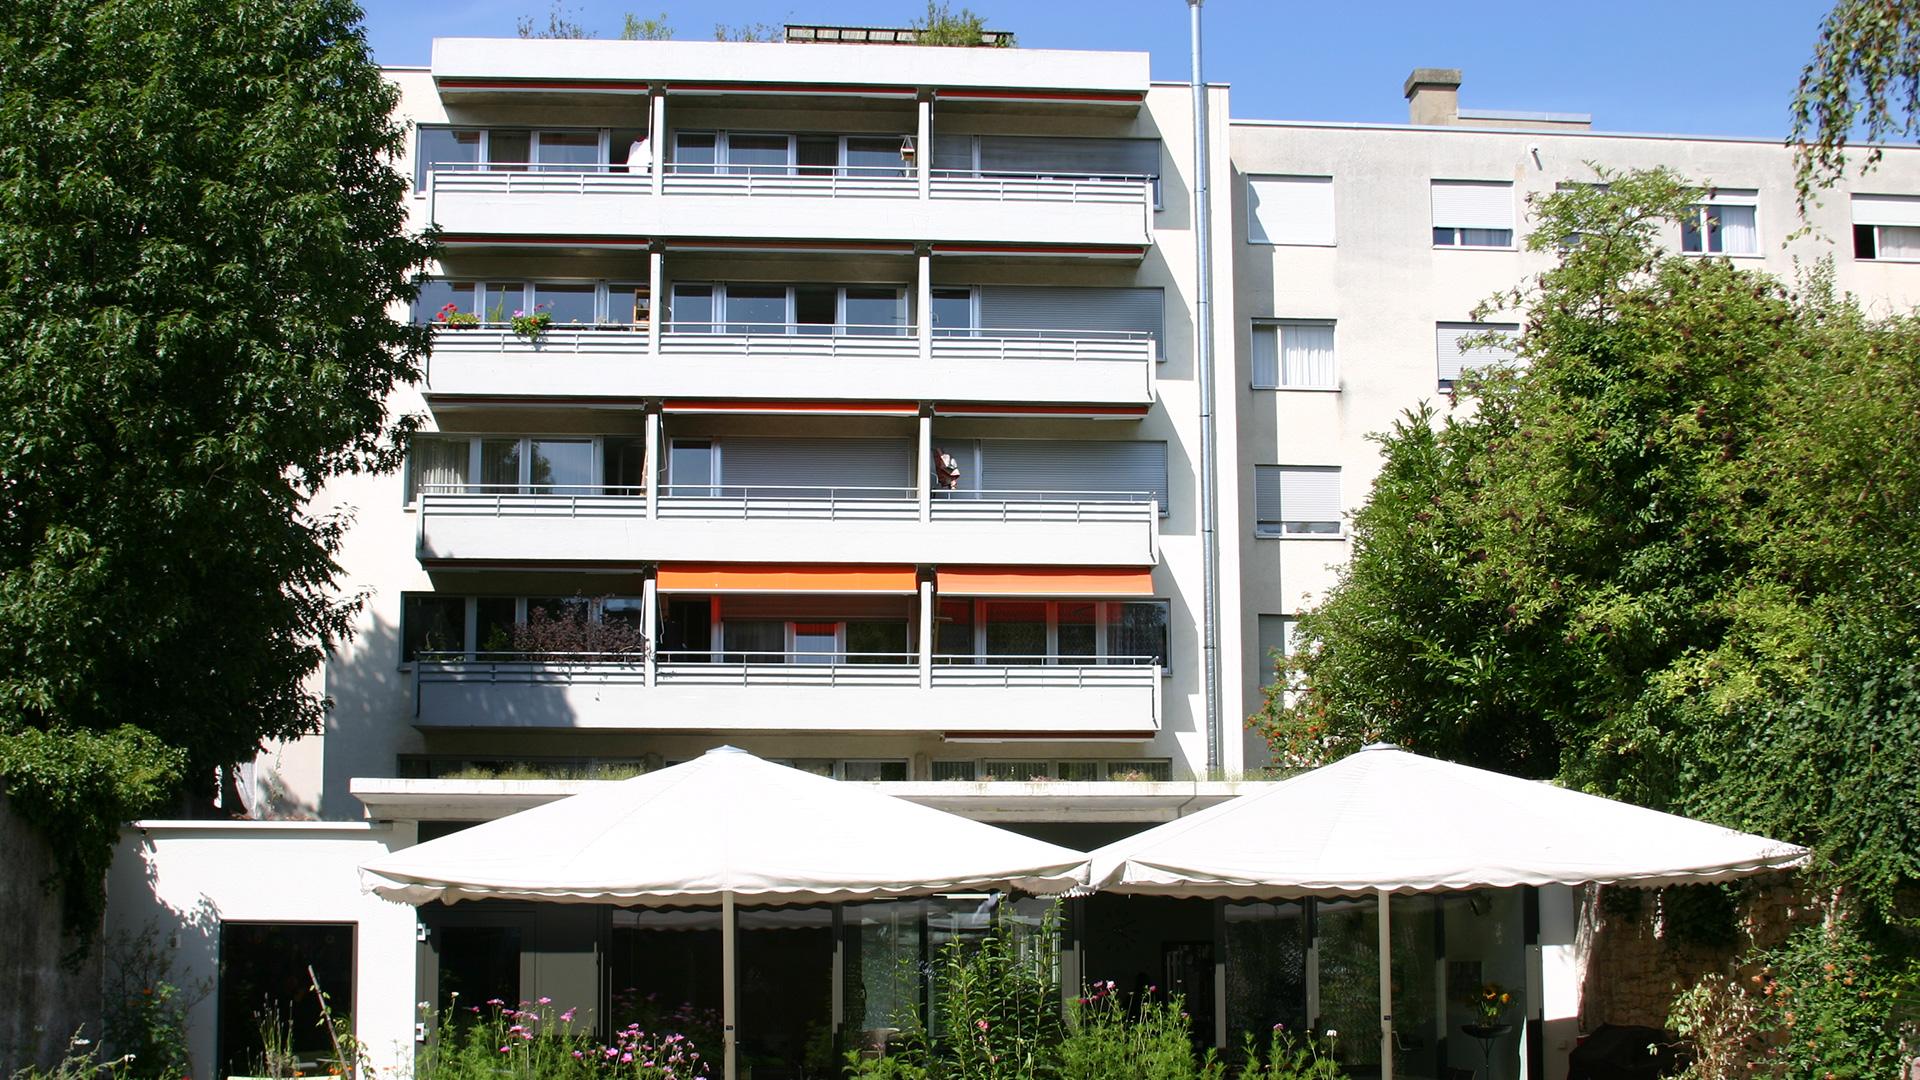 Liegenschaft-Villa-Mobile-in-Basel